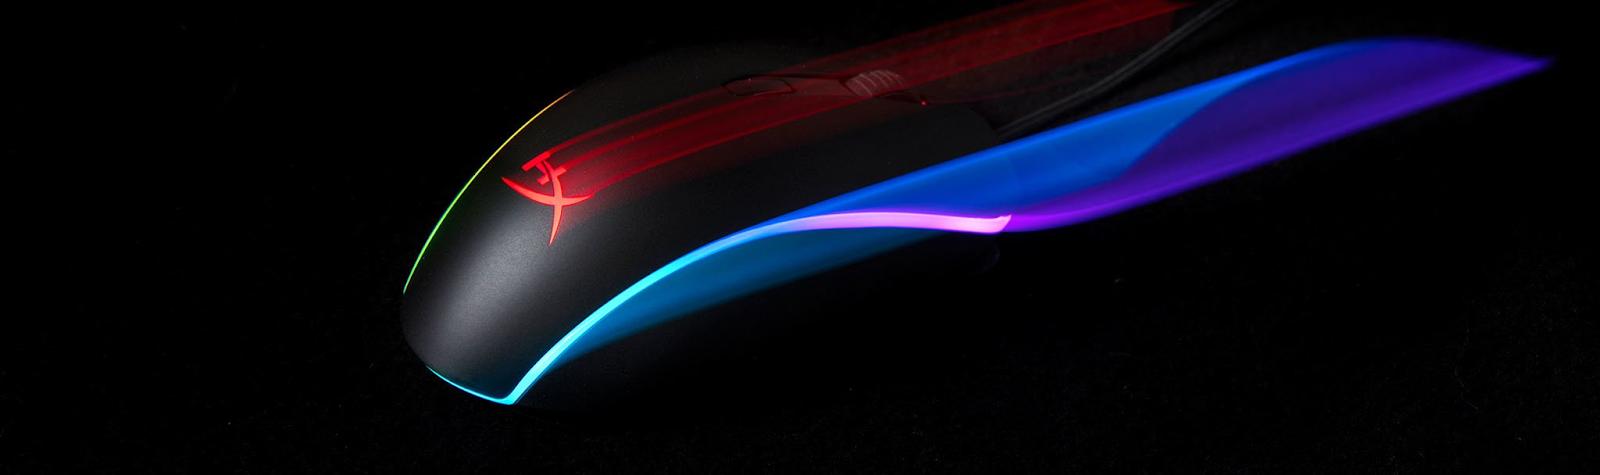 Возможности подсветки HyperX Pulsefire Surge